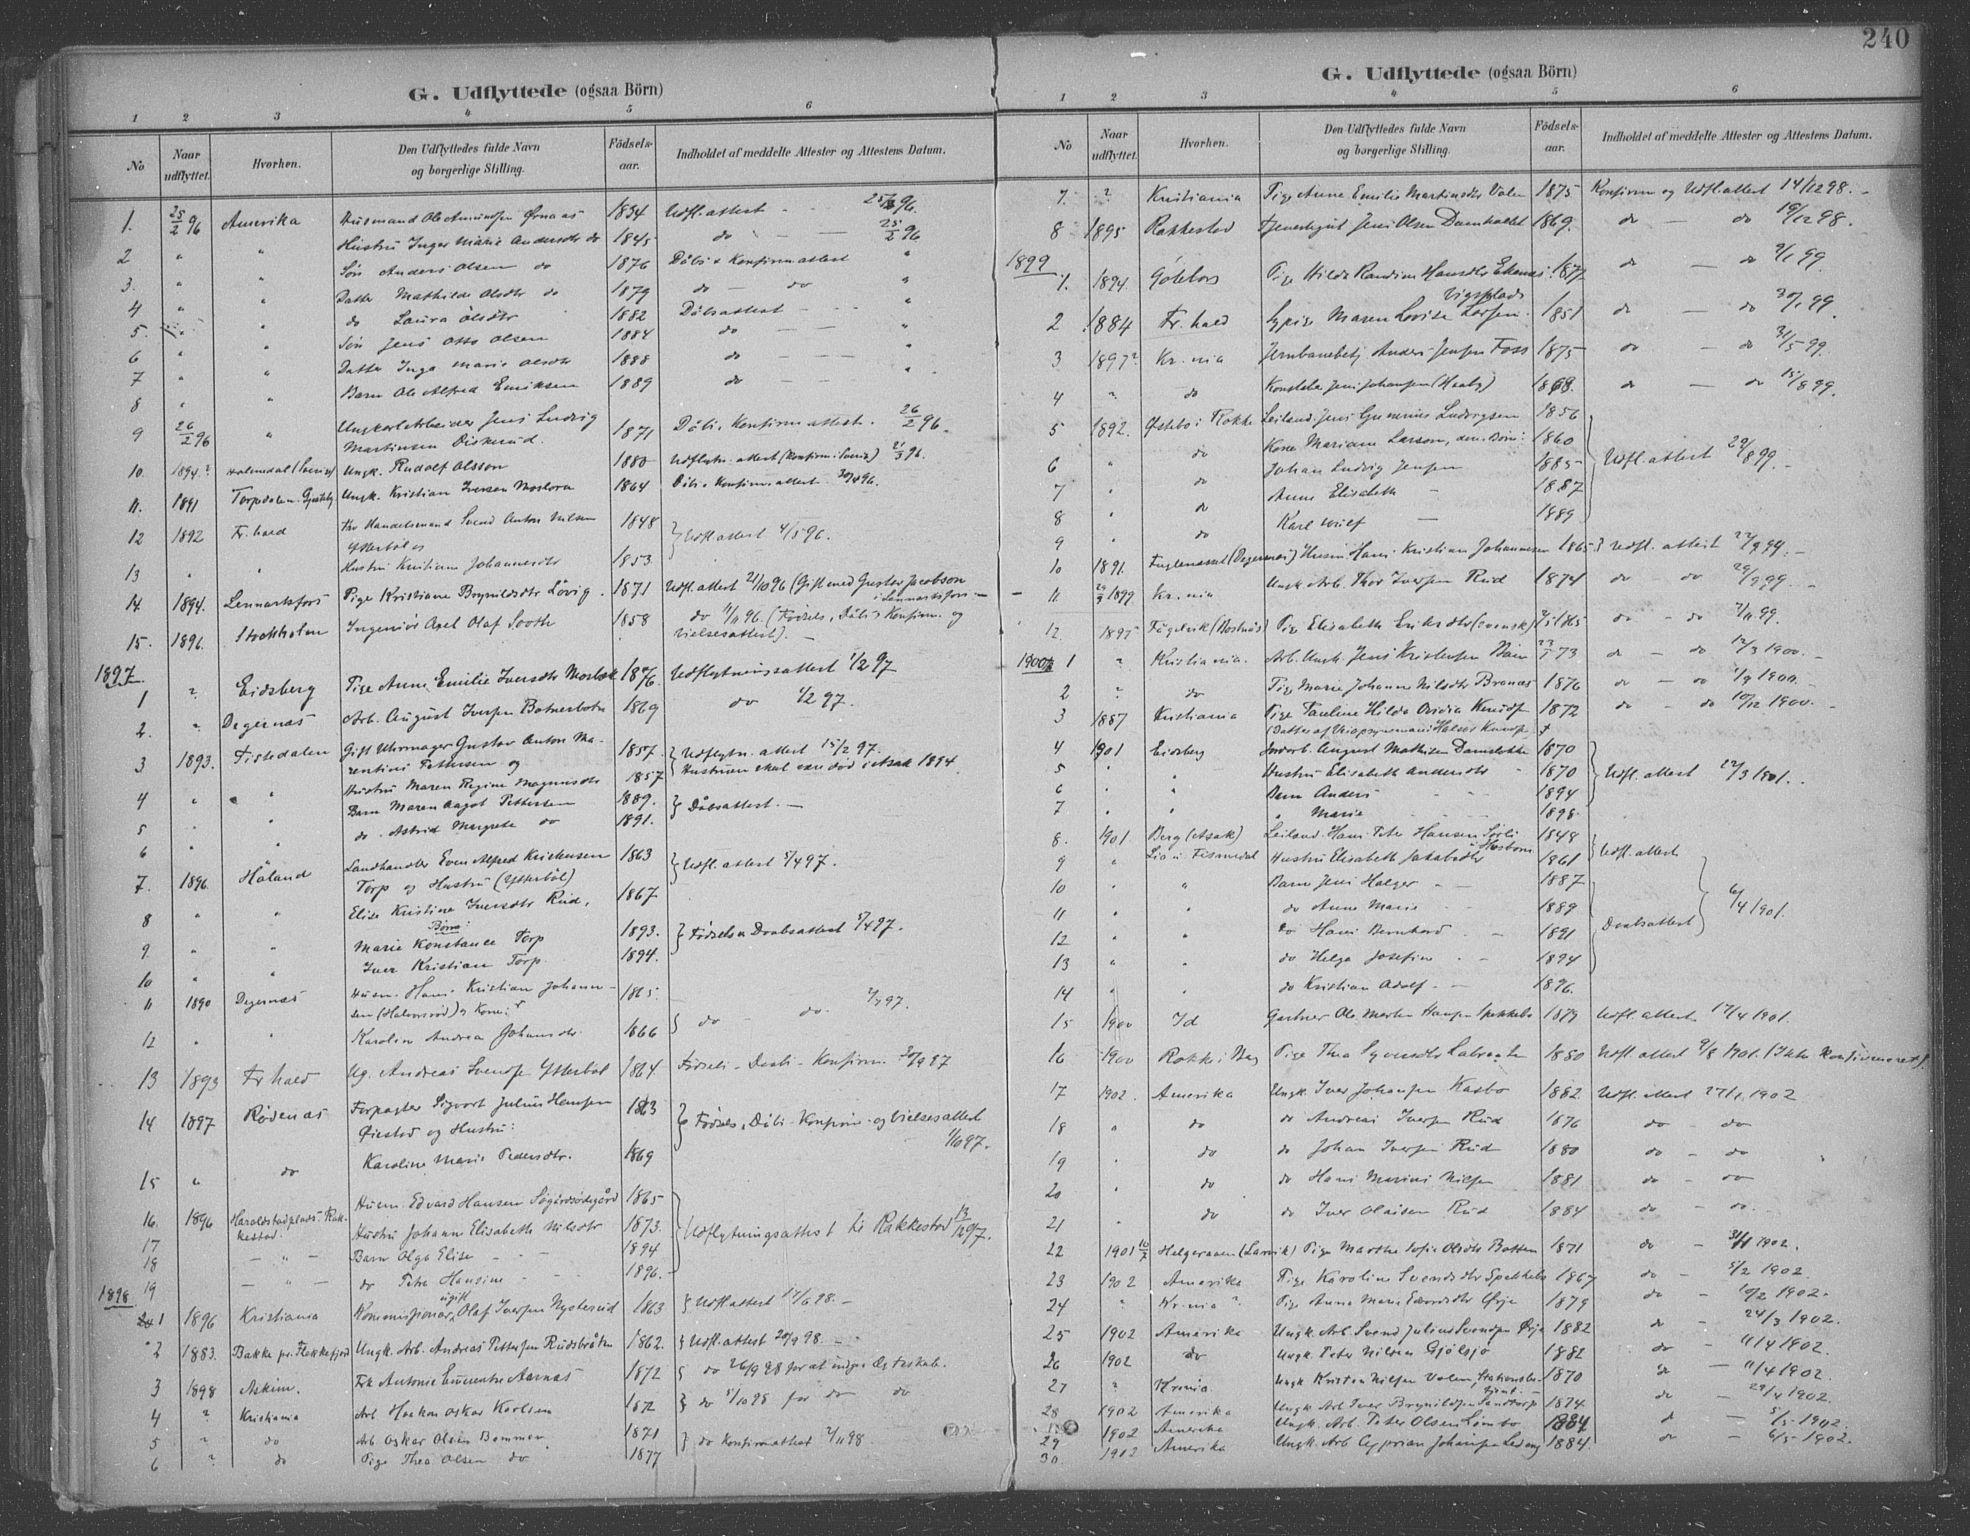 SAO, Aremark prestekontor Kirkebøker, F/Fb/L0005: Ministerialbok nr. II 5, 1895-1919, s. 240